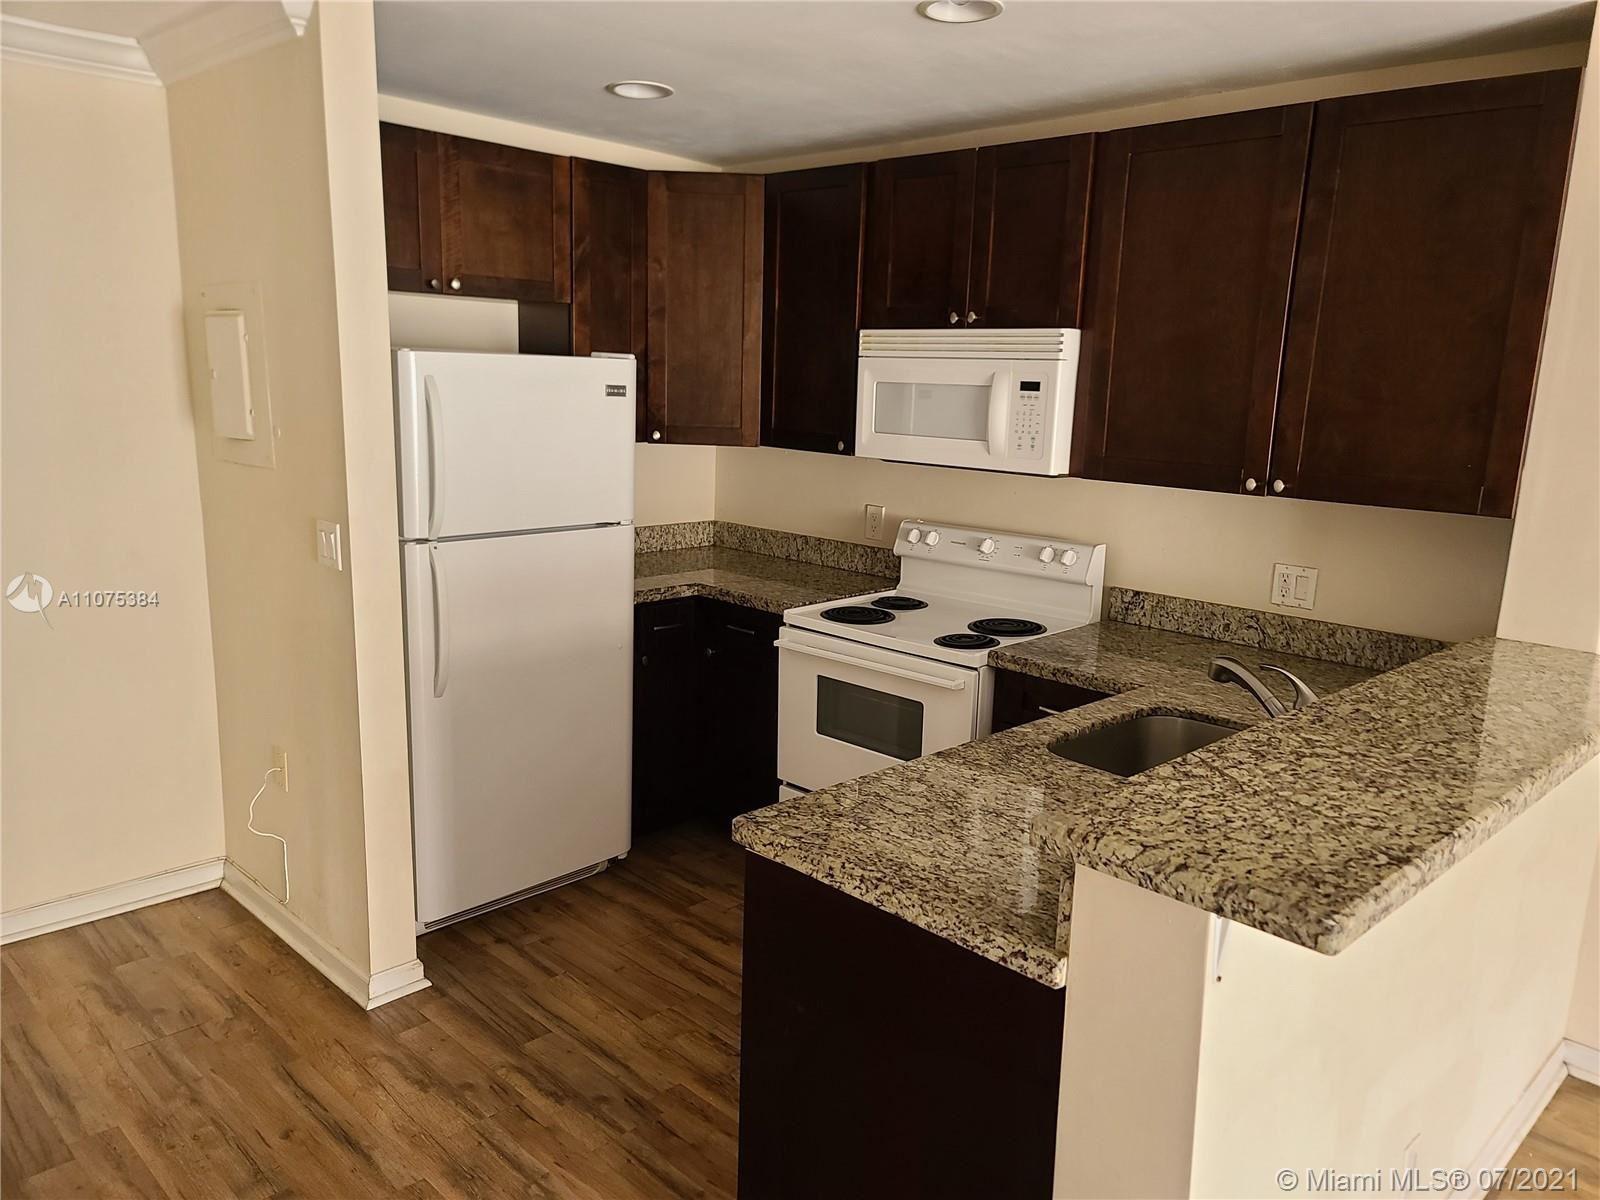 Photo of 10884 Royal Palm Blvd #10884, Coral Springs, FL 33065 (MLS # A11075384)